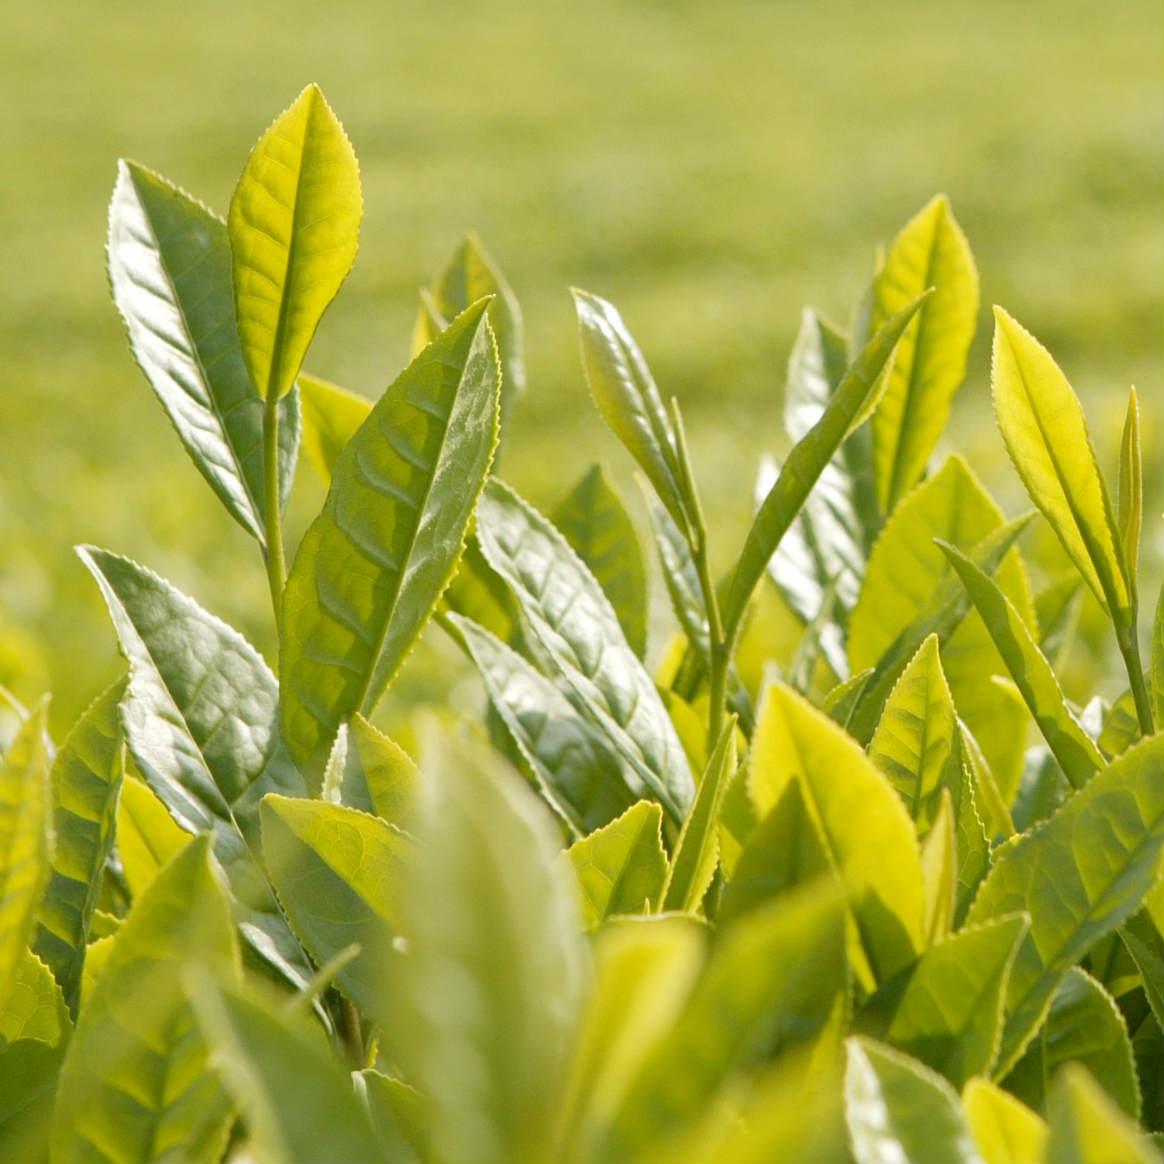 Wholesale professional manufacturer supply green powder organic matcha japan with best quality - 4uTea | 4uTea.com